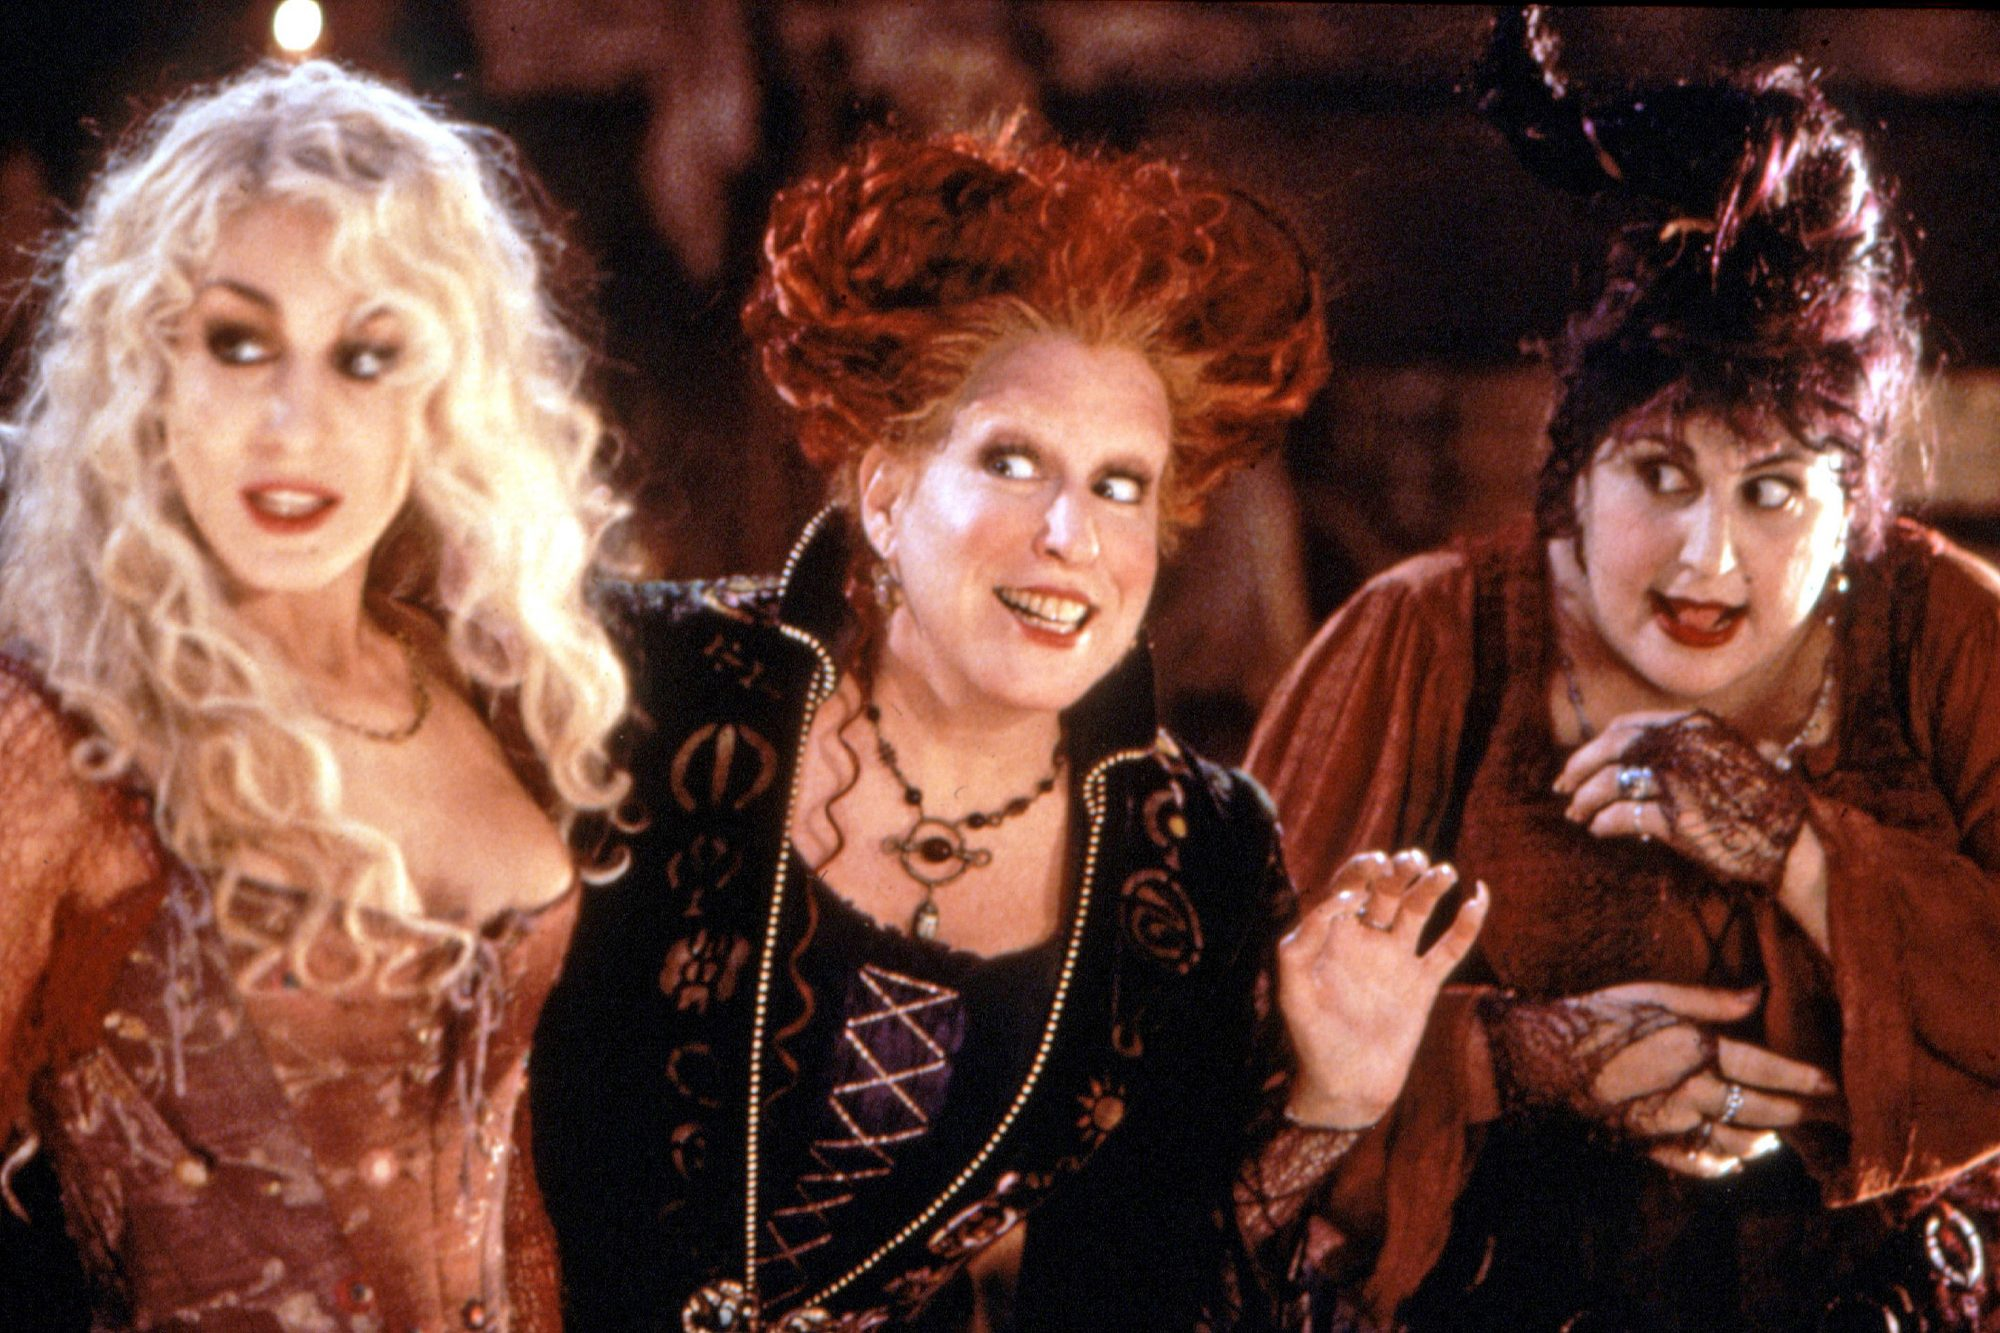 HOCUS POCUS, Sarah Jessica Parker, Bette Midler, Kathy Najimy, 1993, (c)Buena Vista Pictures/courtes